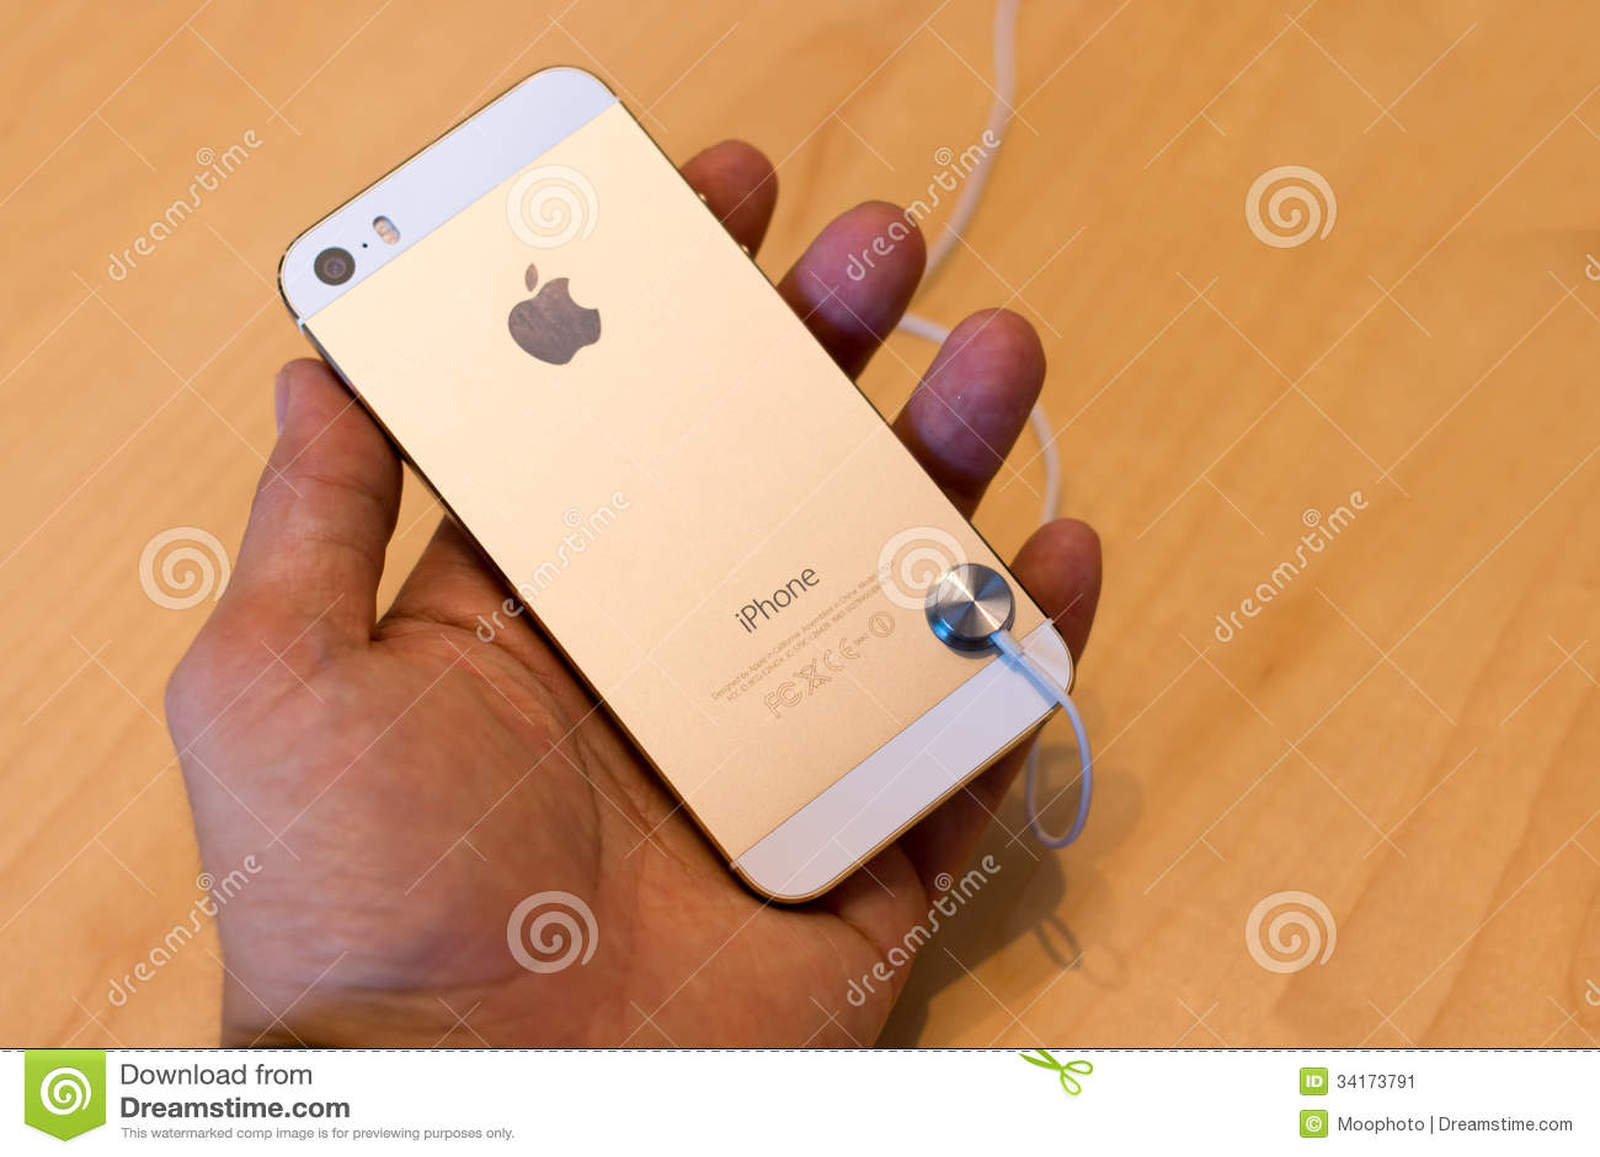 apple store iphone 5s